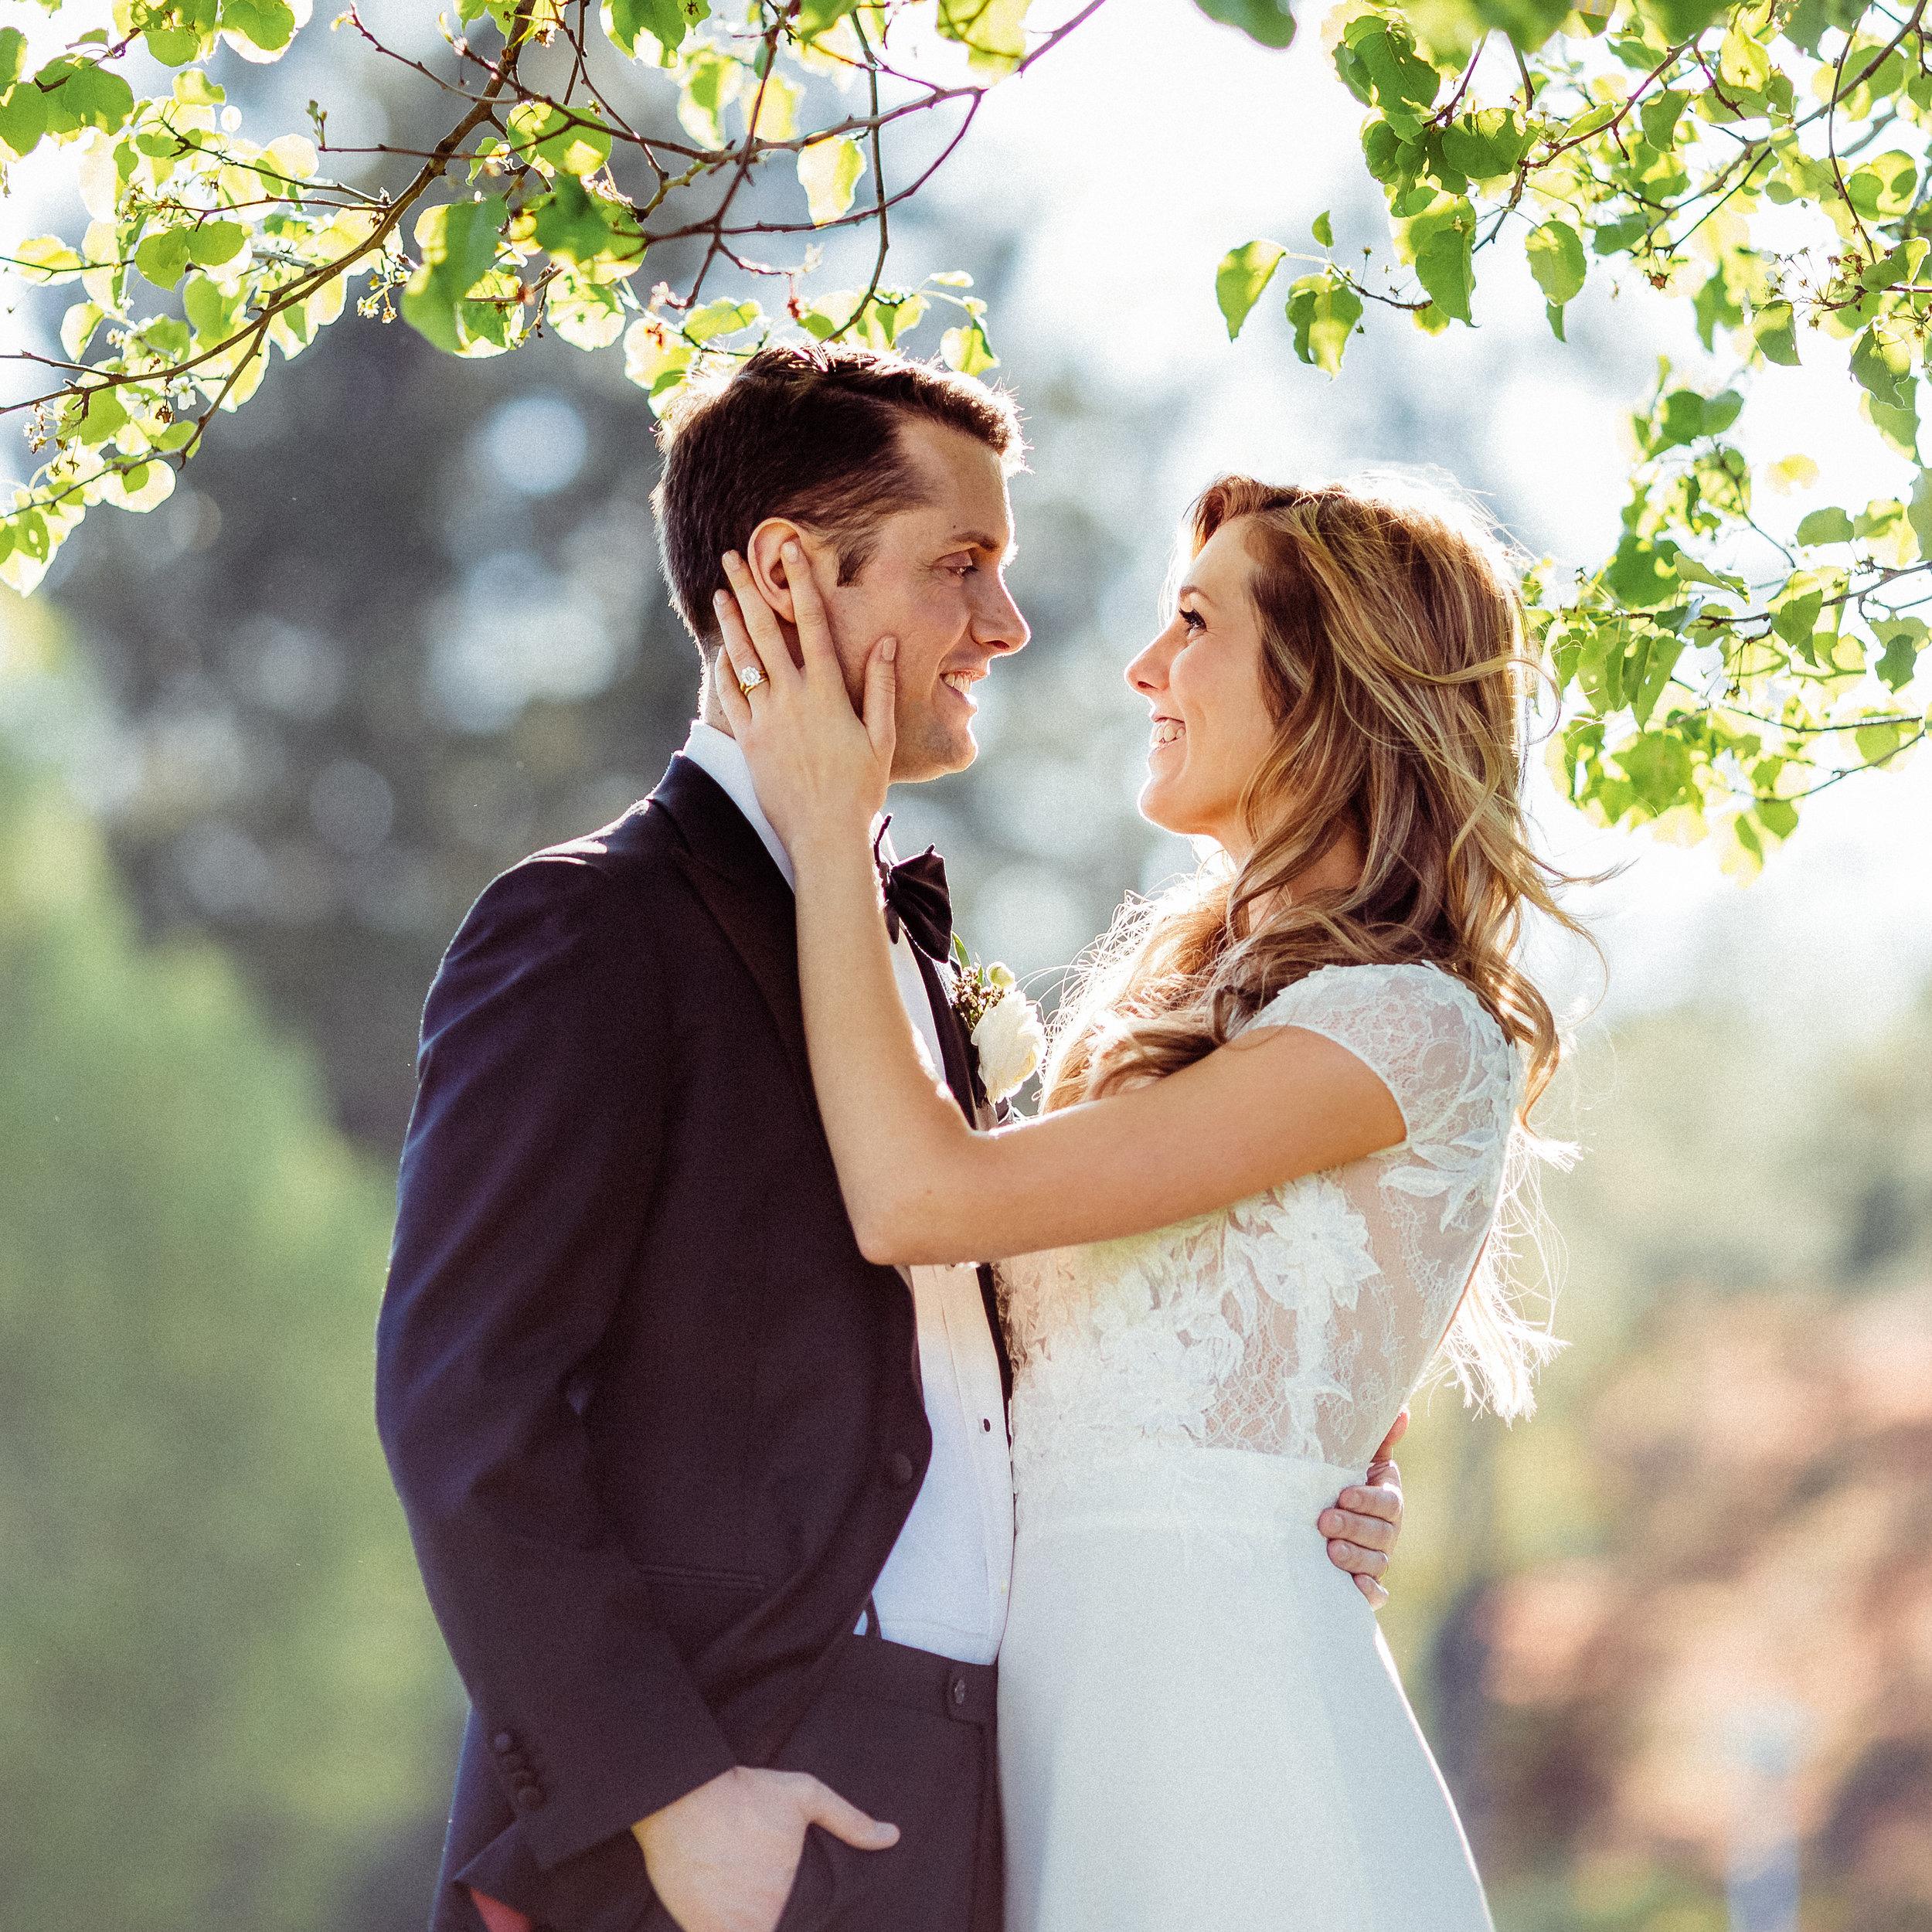 New_Jersey_wedding_photography_Peter_Rigo_Photography_Adair_Andrew__140.jpg